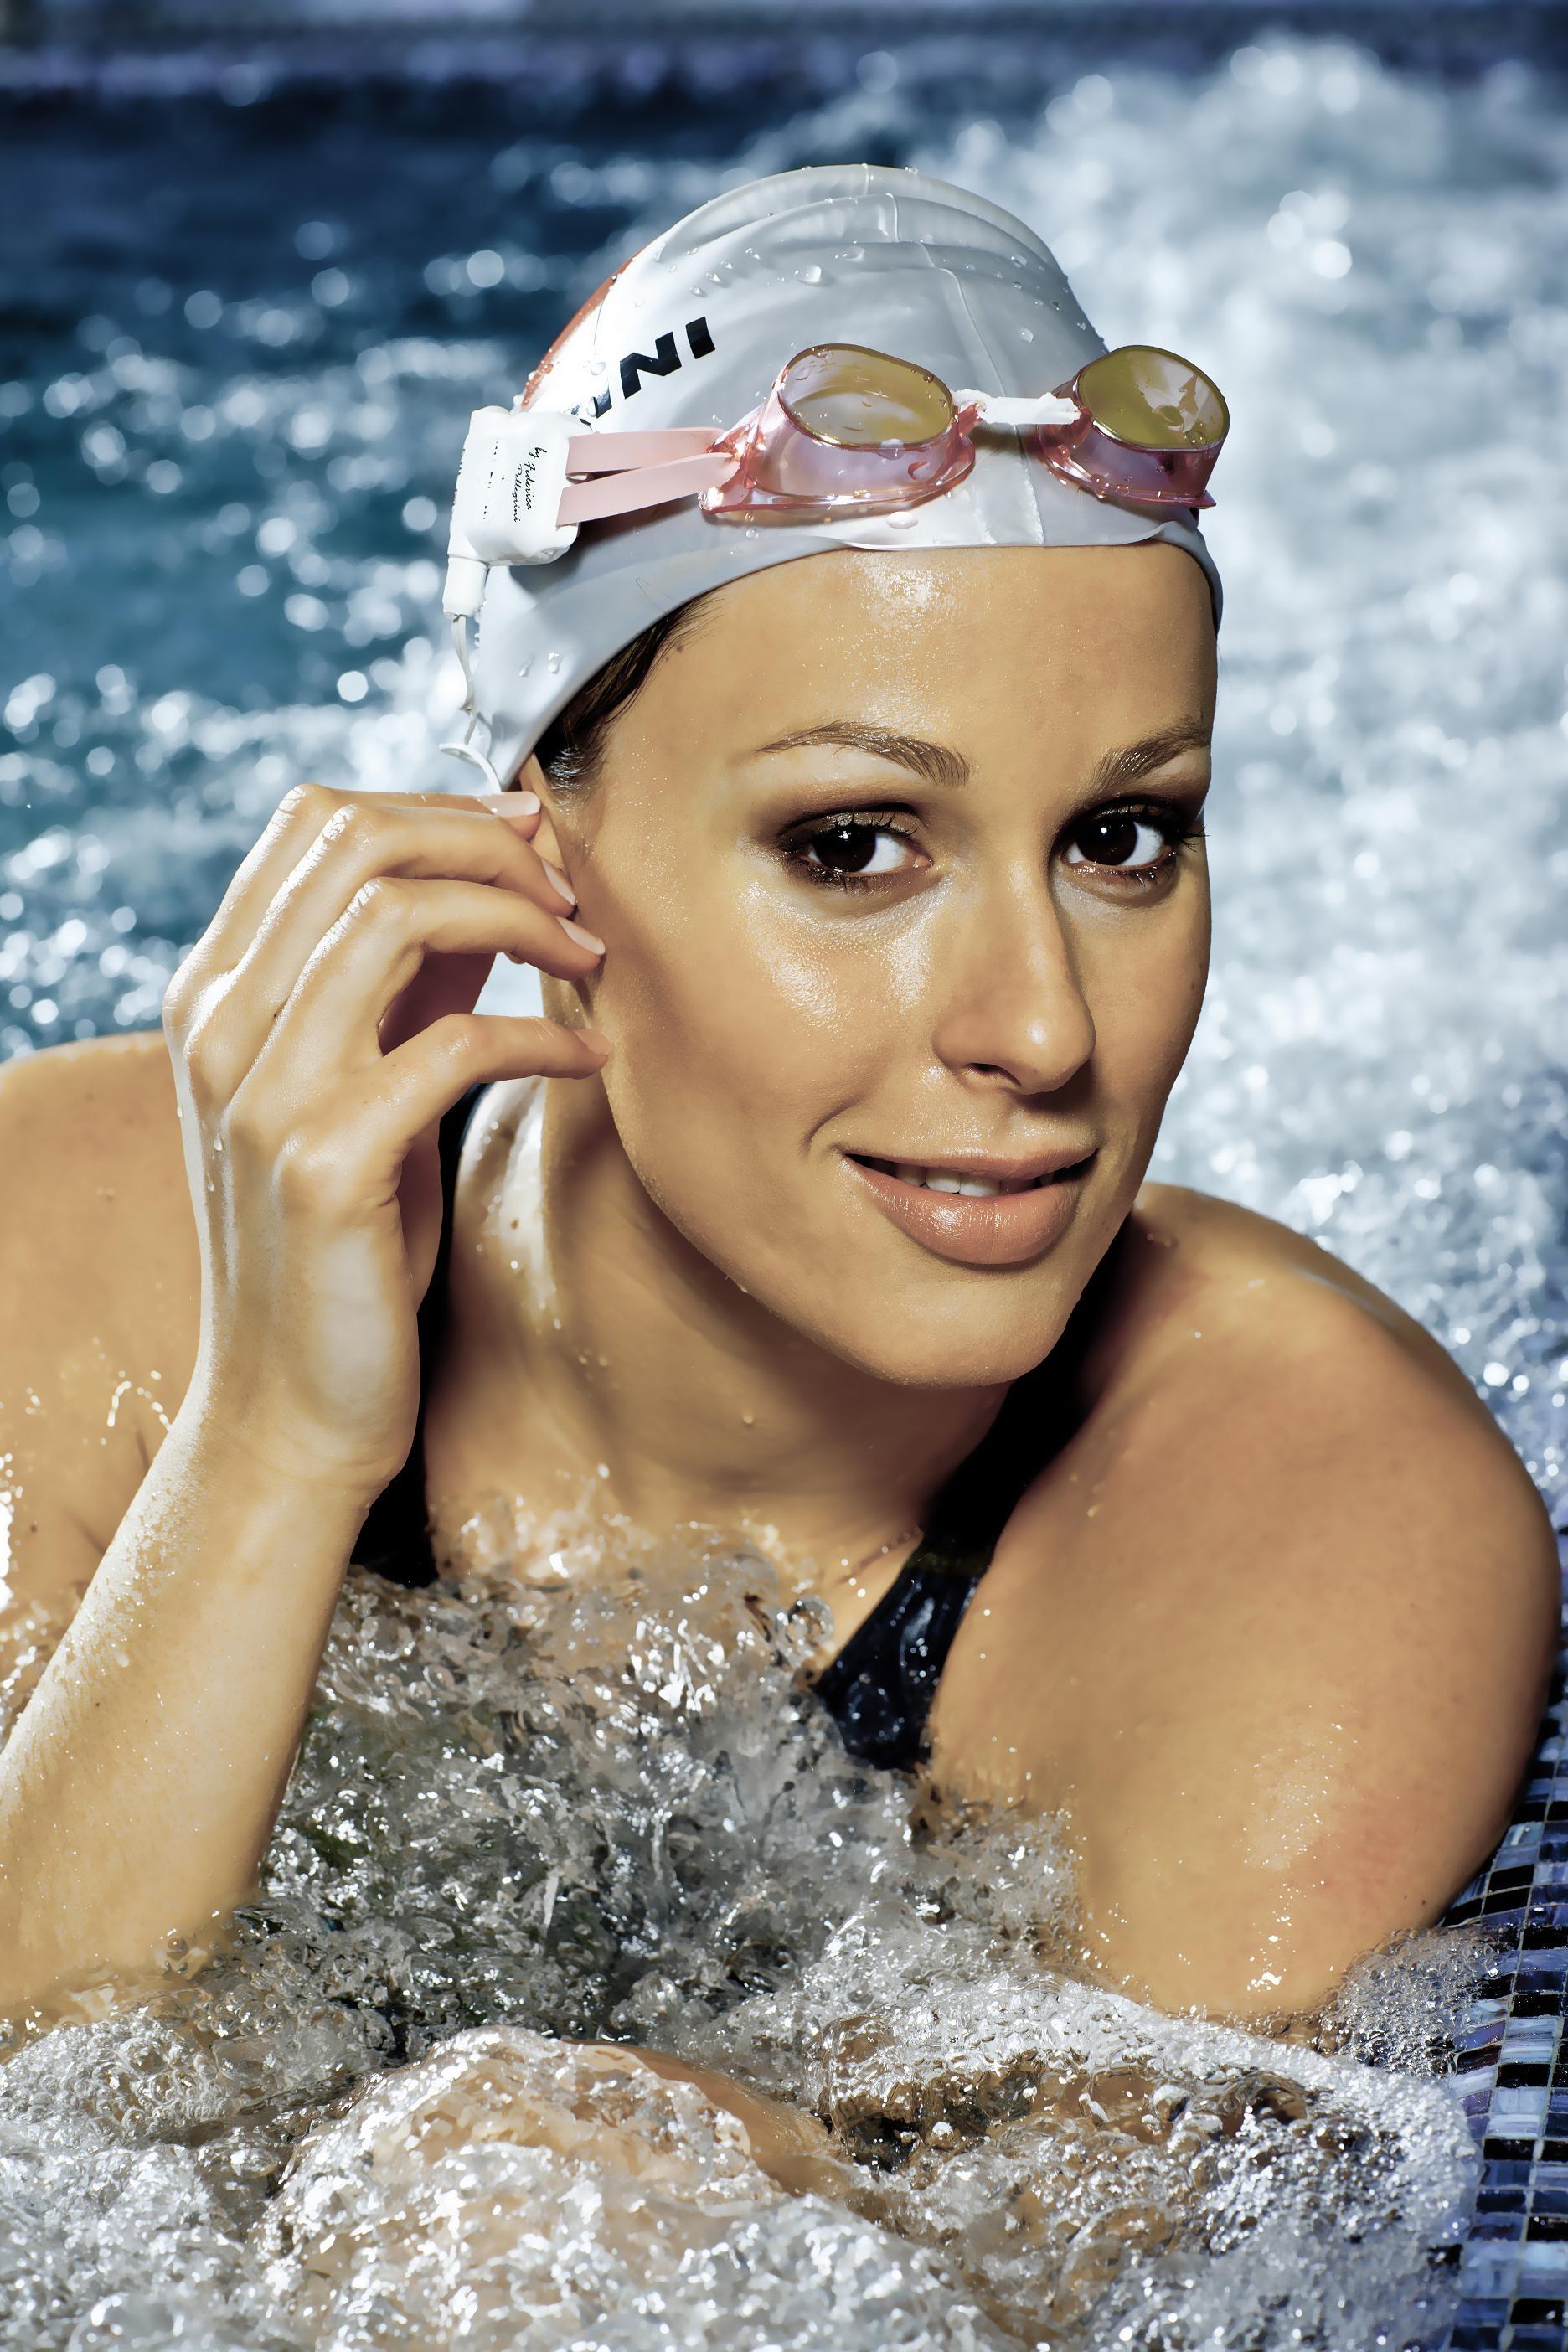 Nuoto/ Federica Pellegrini vince l'oro nei 400 stile libero femminili ai Mondiali di Shanghai - federica-pellegrini-new5